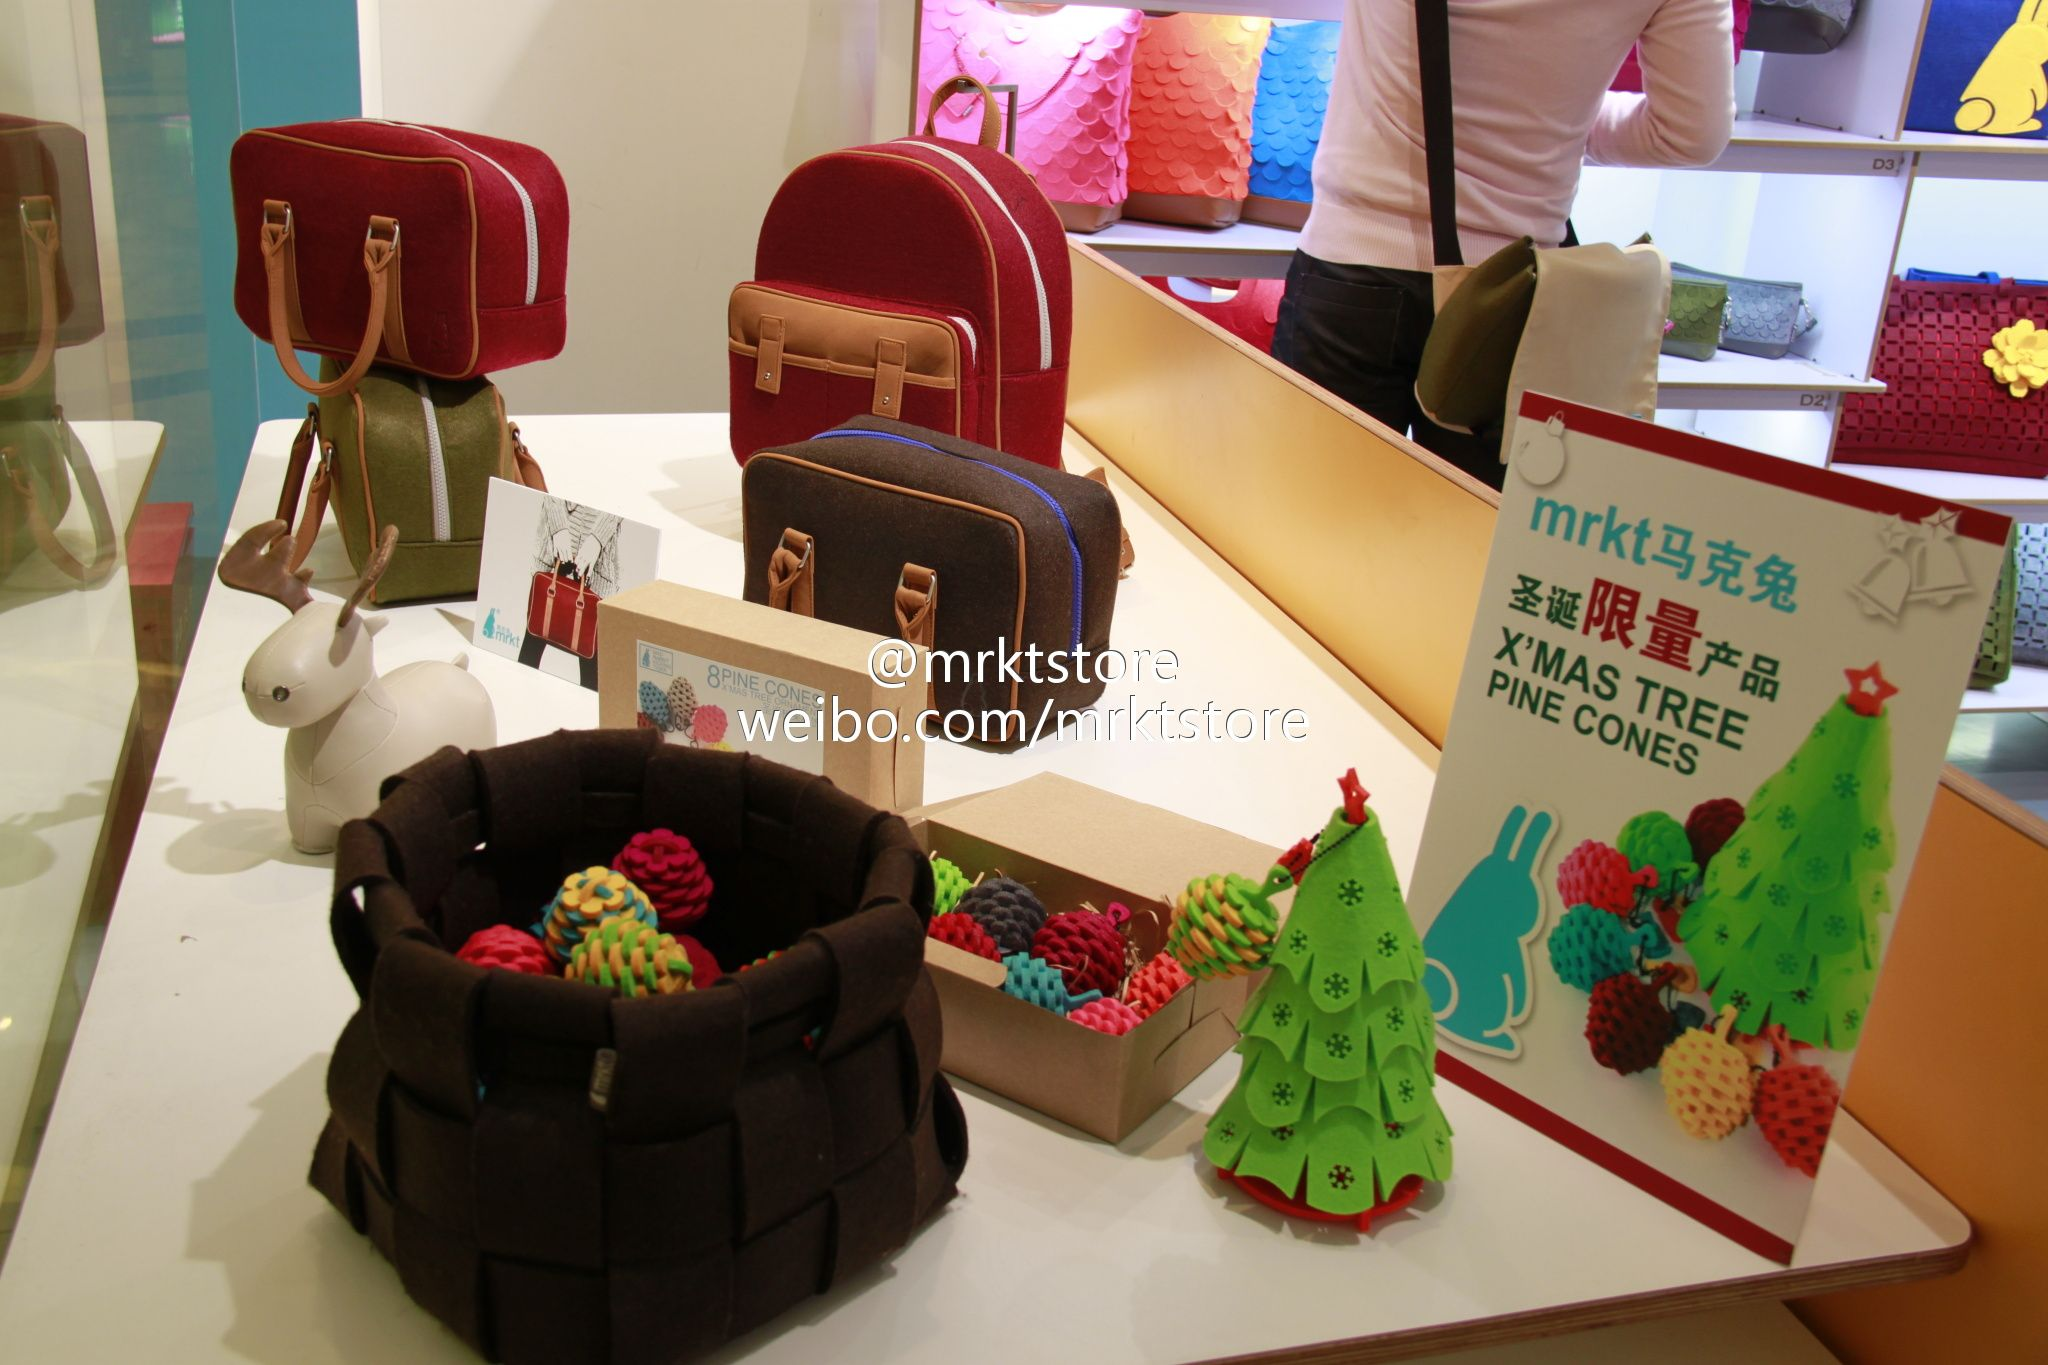 Mad Rabbit Kicking Tiger mrkt felt Christmas tree and pine cone DIY sets. www.mrktstore.com